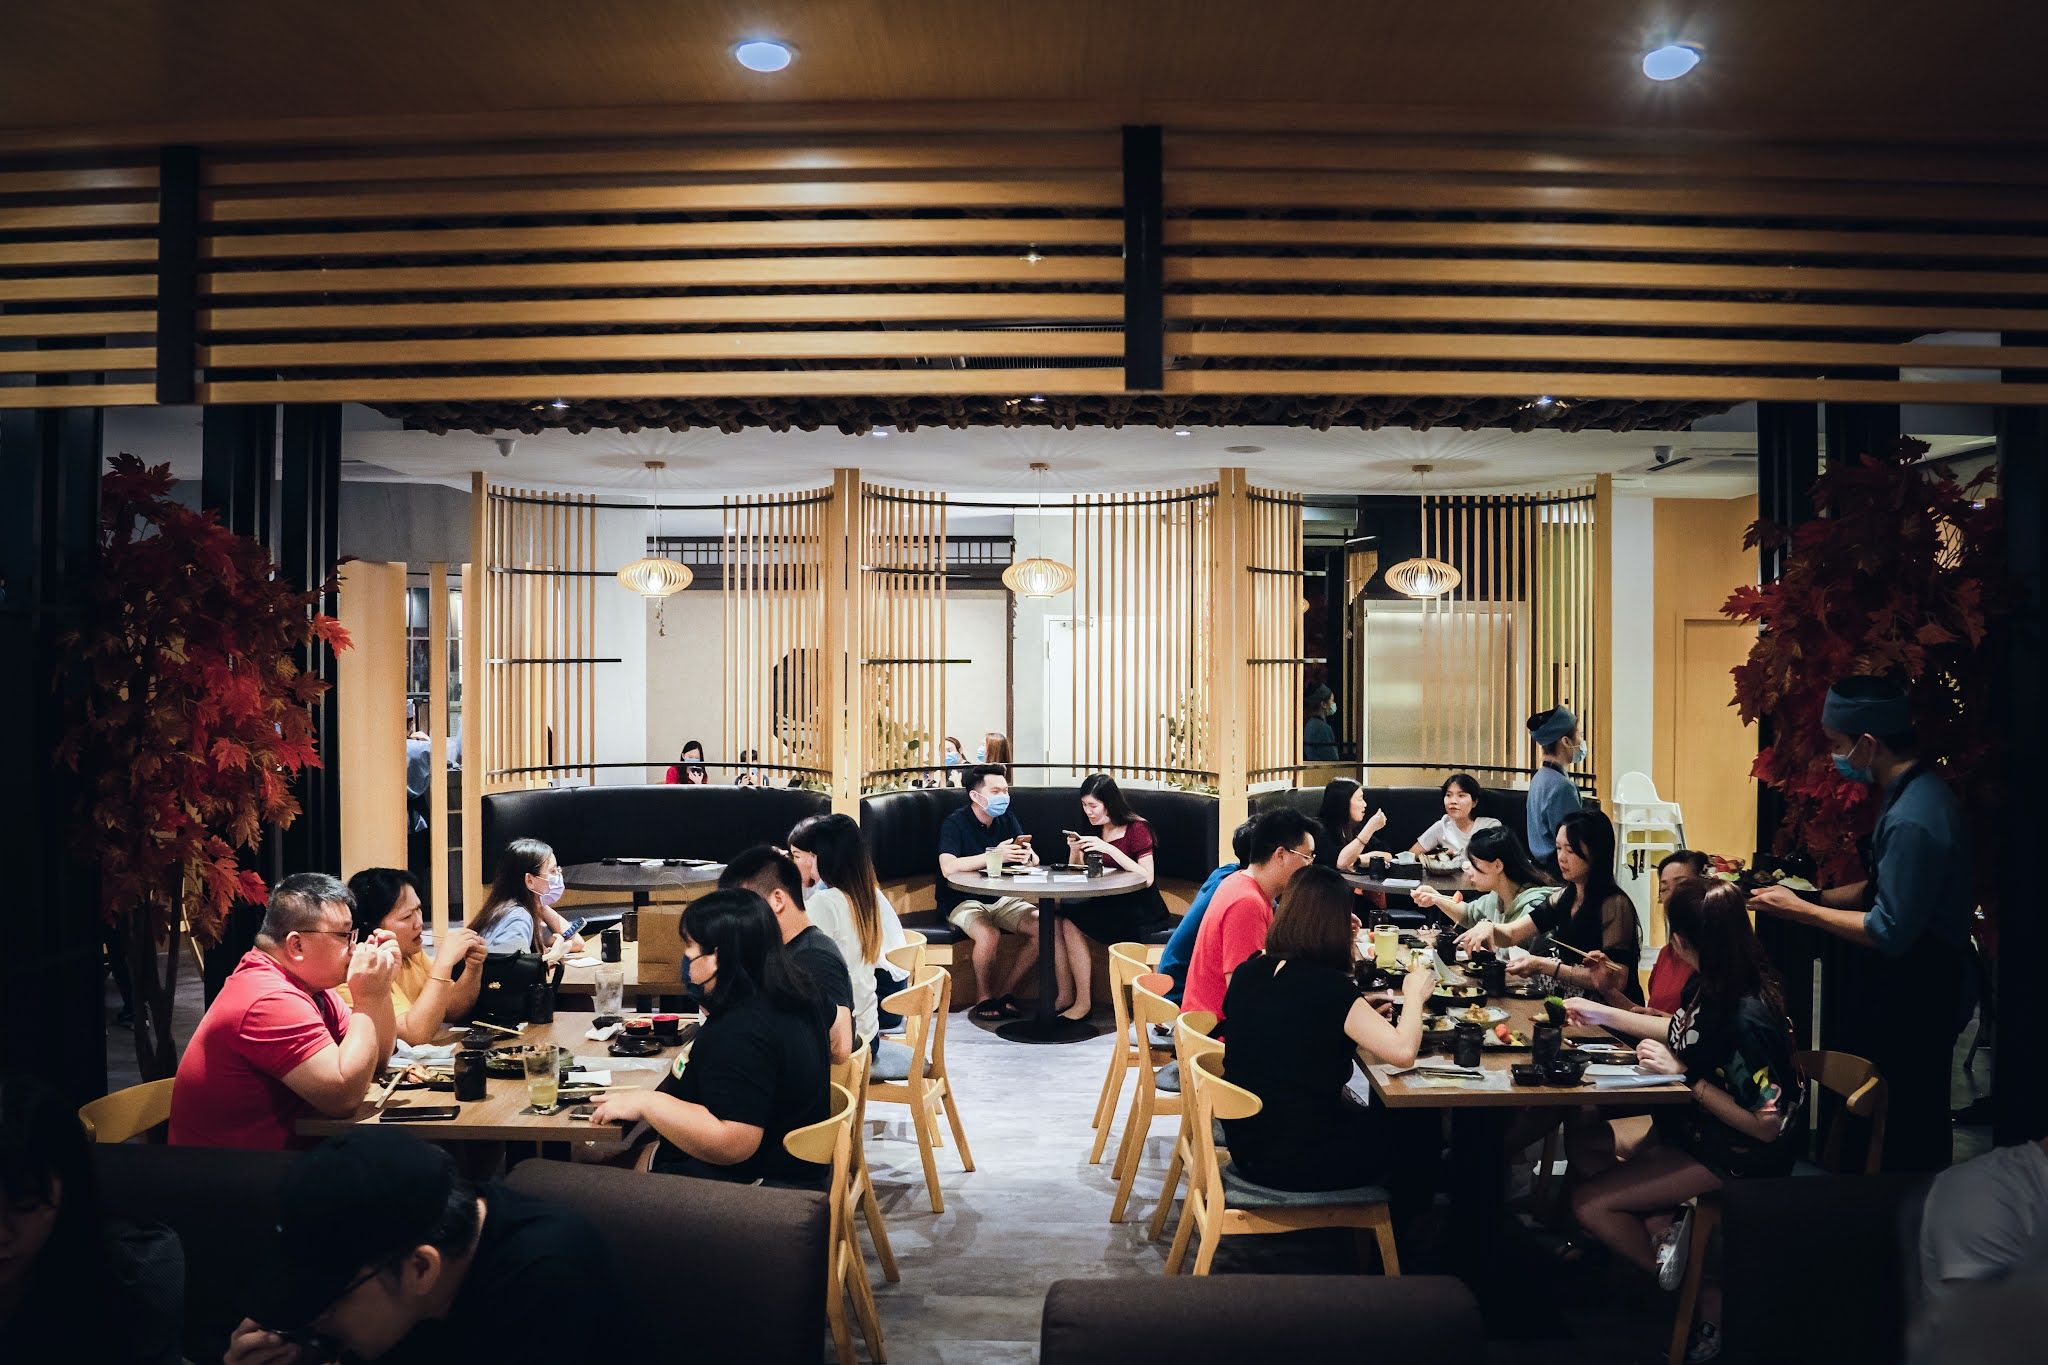 juugatsu ten: sri petaling's sleekest japanese restaurant welcomes diners back for donburi & more